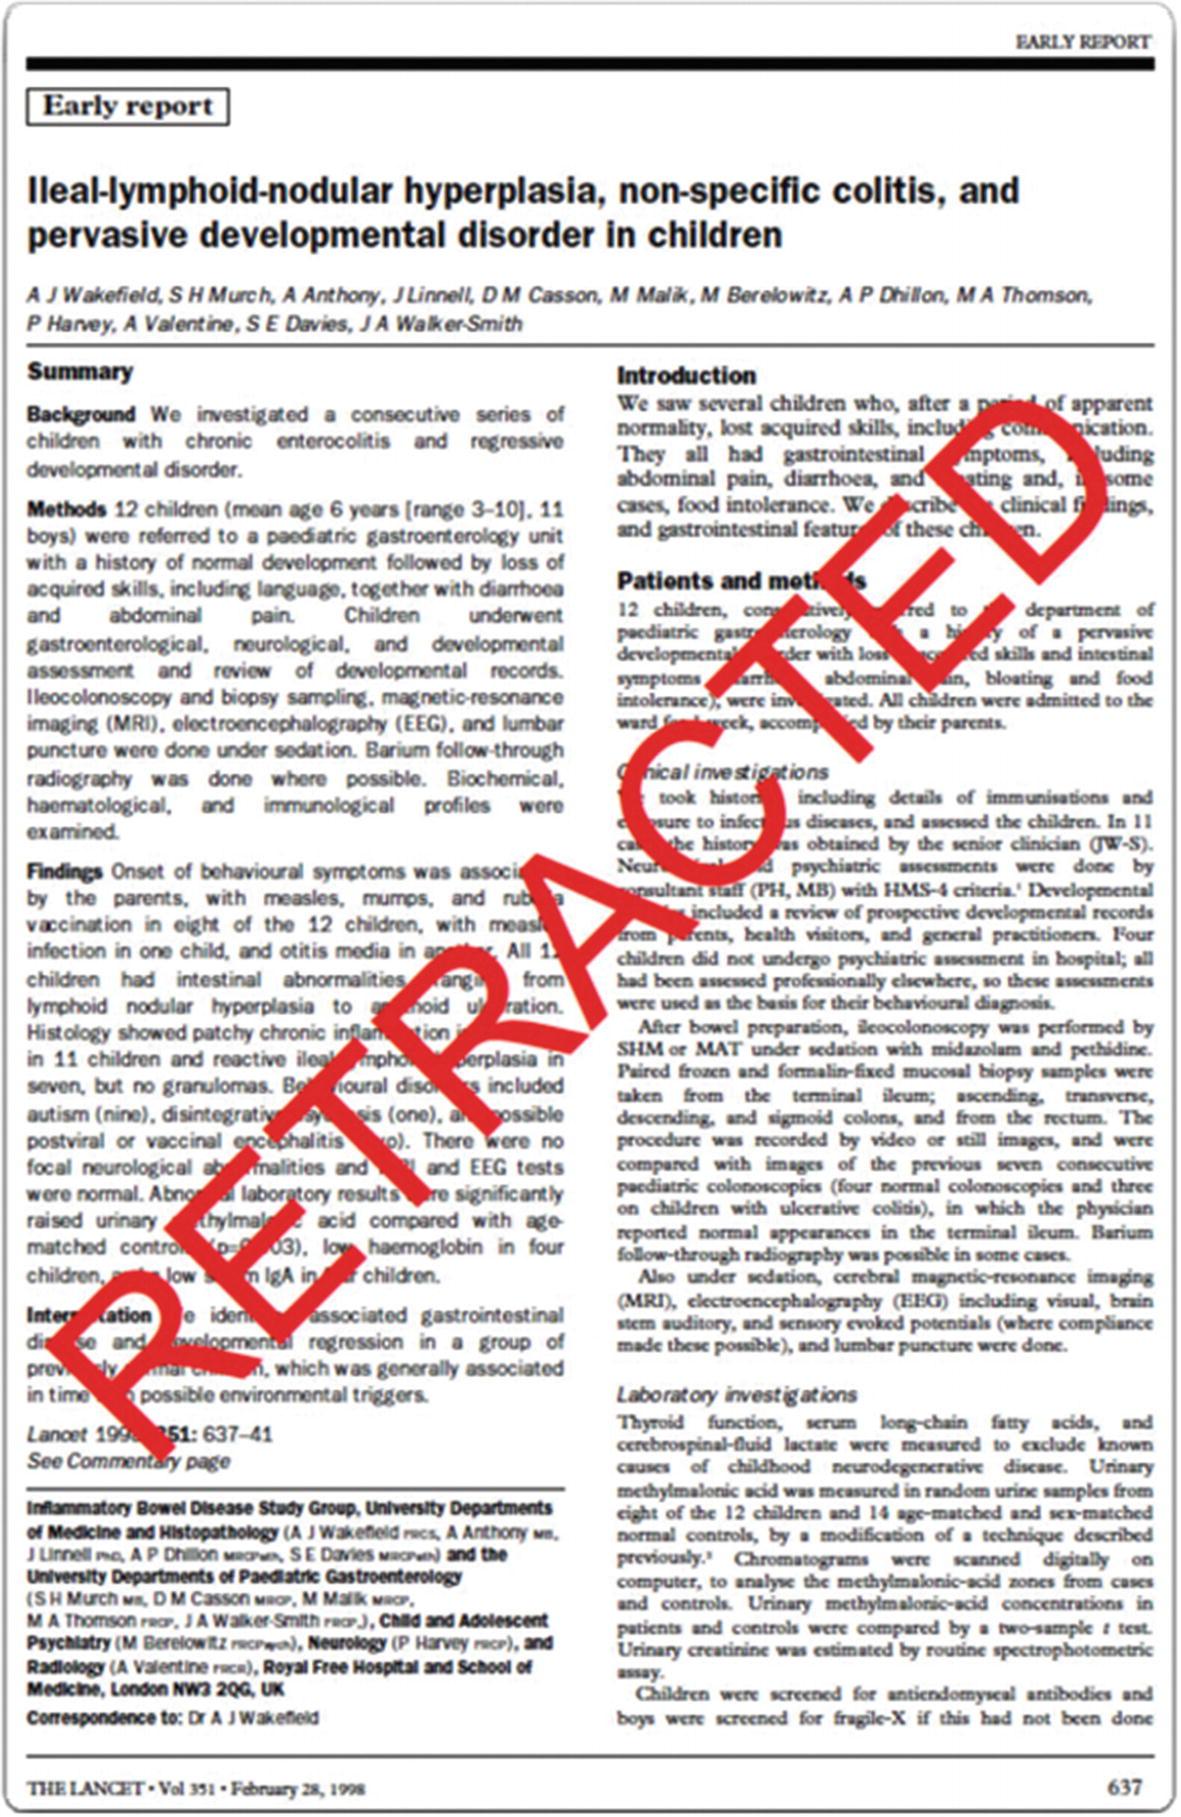 Research Errors | SpringerLink